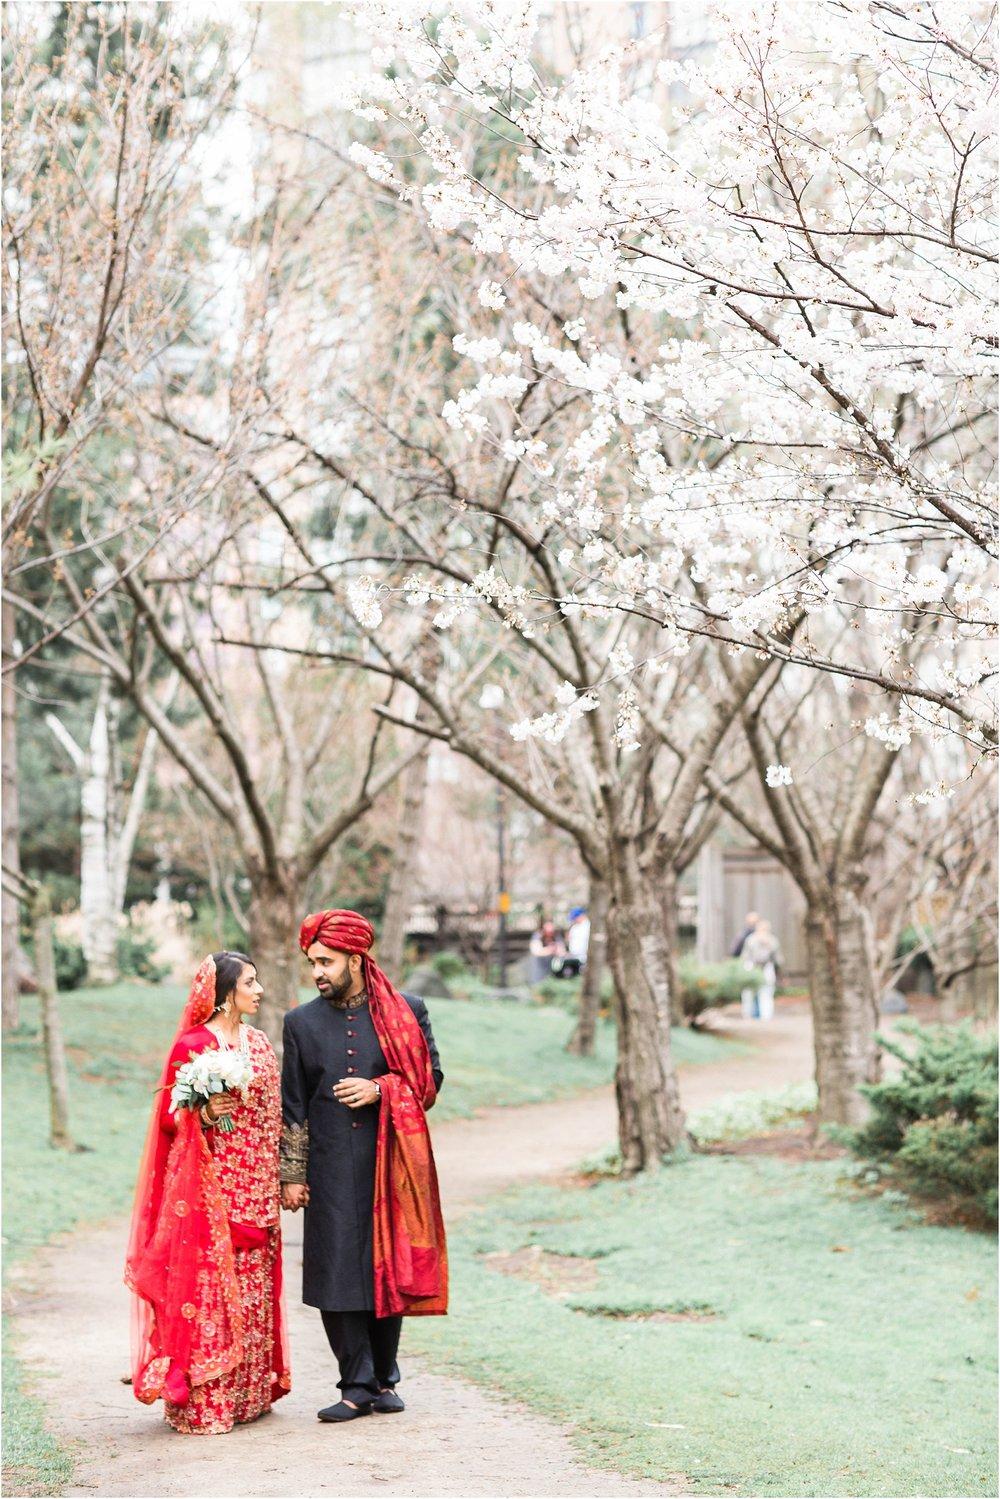 Jame-Masjid-Coopers-Mosque-Kariya-Park-Cherry-Blossoms-Wedding-Toronto-Mississauga-Brampton-Scarborough-GTA-Pakistani-Indian-Wedding-Engagement-Photographer-Photography_0060.jpg